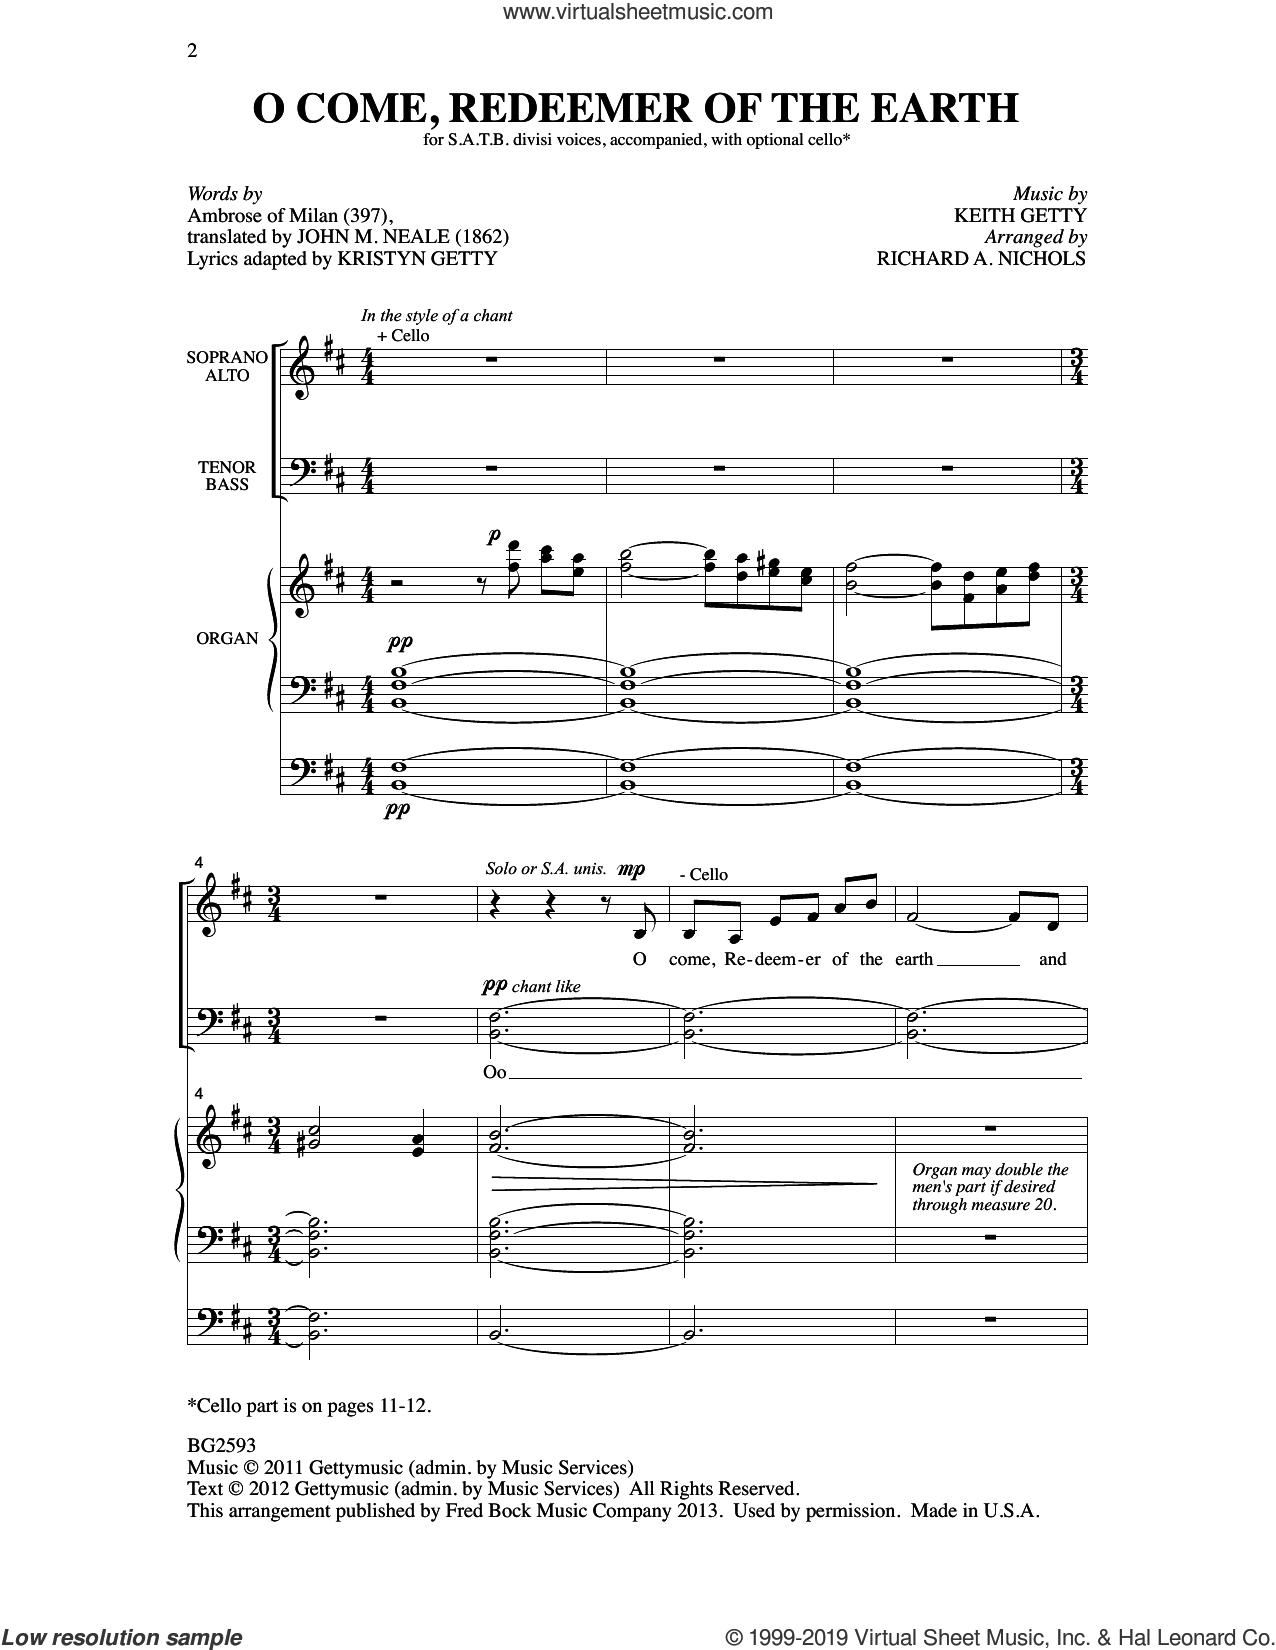 O Come, Redeemer Of The Earth (arr. Richard A. Nichols) sheet music for choir (SATB: soprano, alto, tenor, bass) by Keith Getty and Richard A. Nichols, intermediate skill level